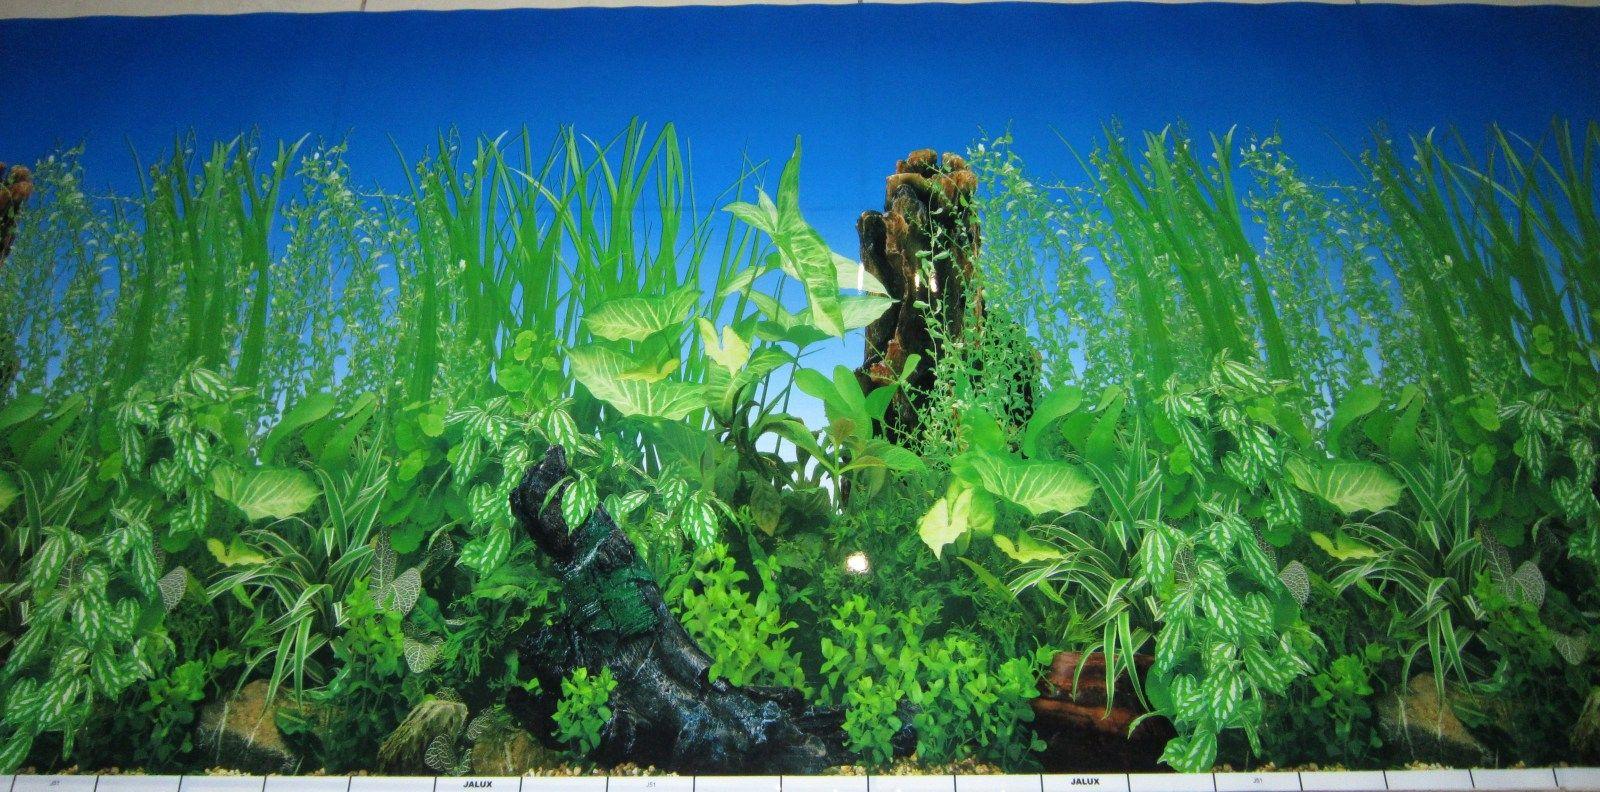 Aquarium Background Pictures - WallpaperSafari   1600 x 792 jpeg 308kB